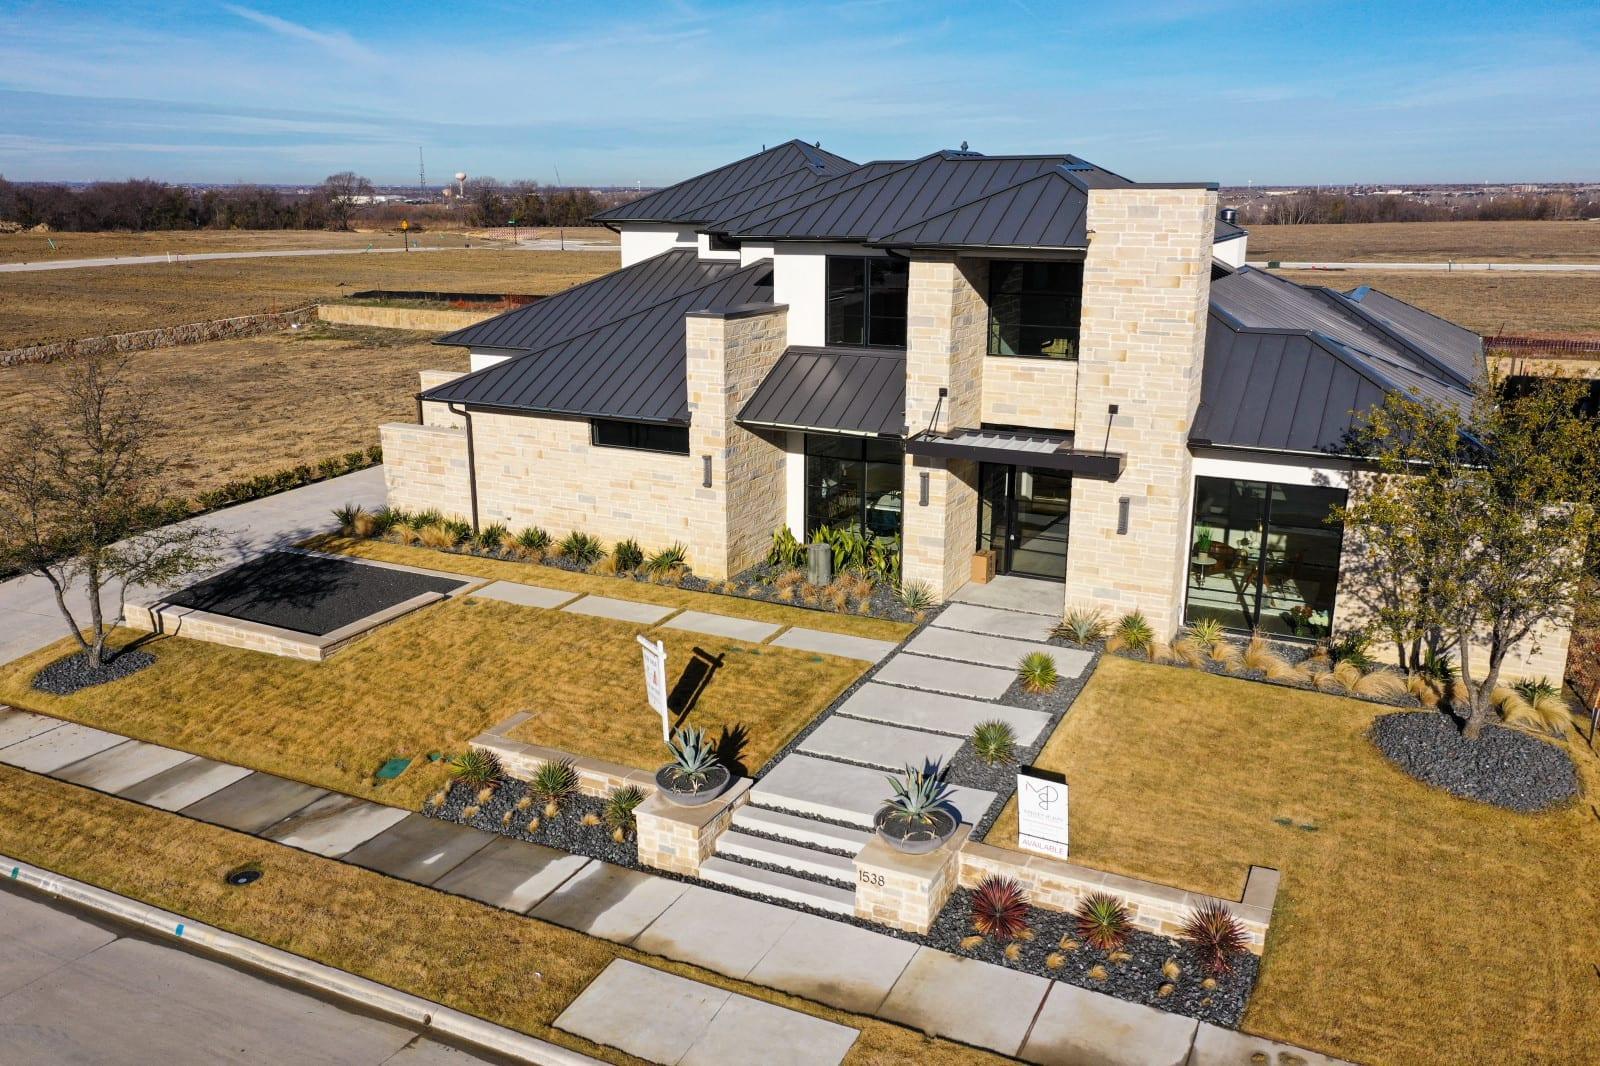 Modern Style Homes design # 5 - Millennial Design + Build